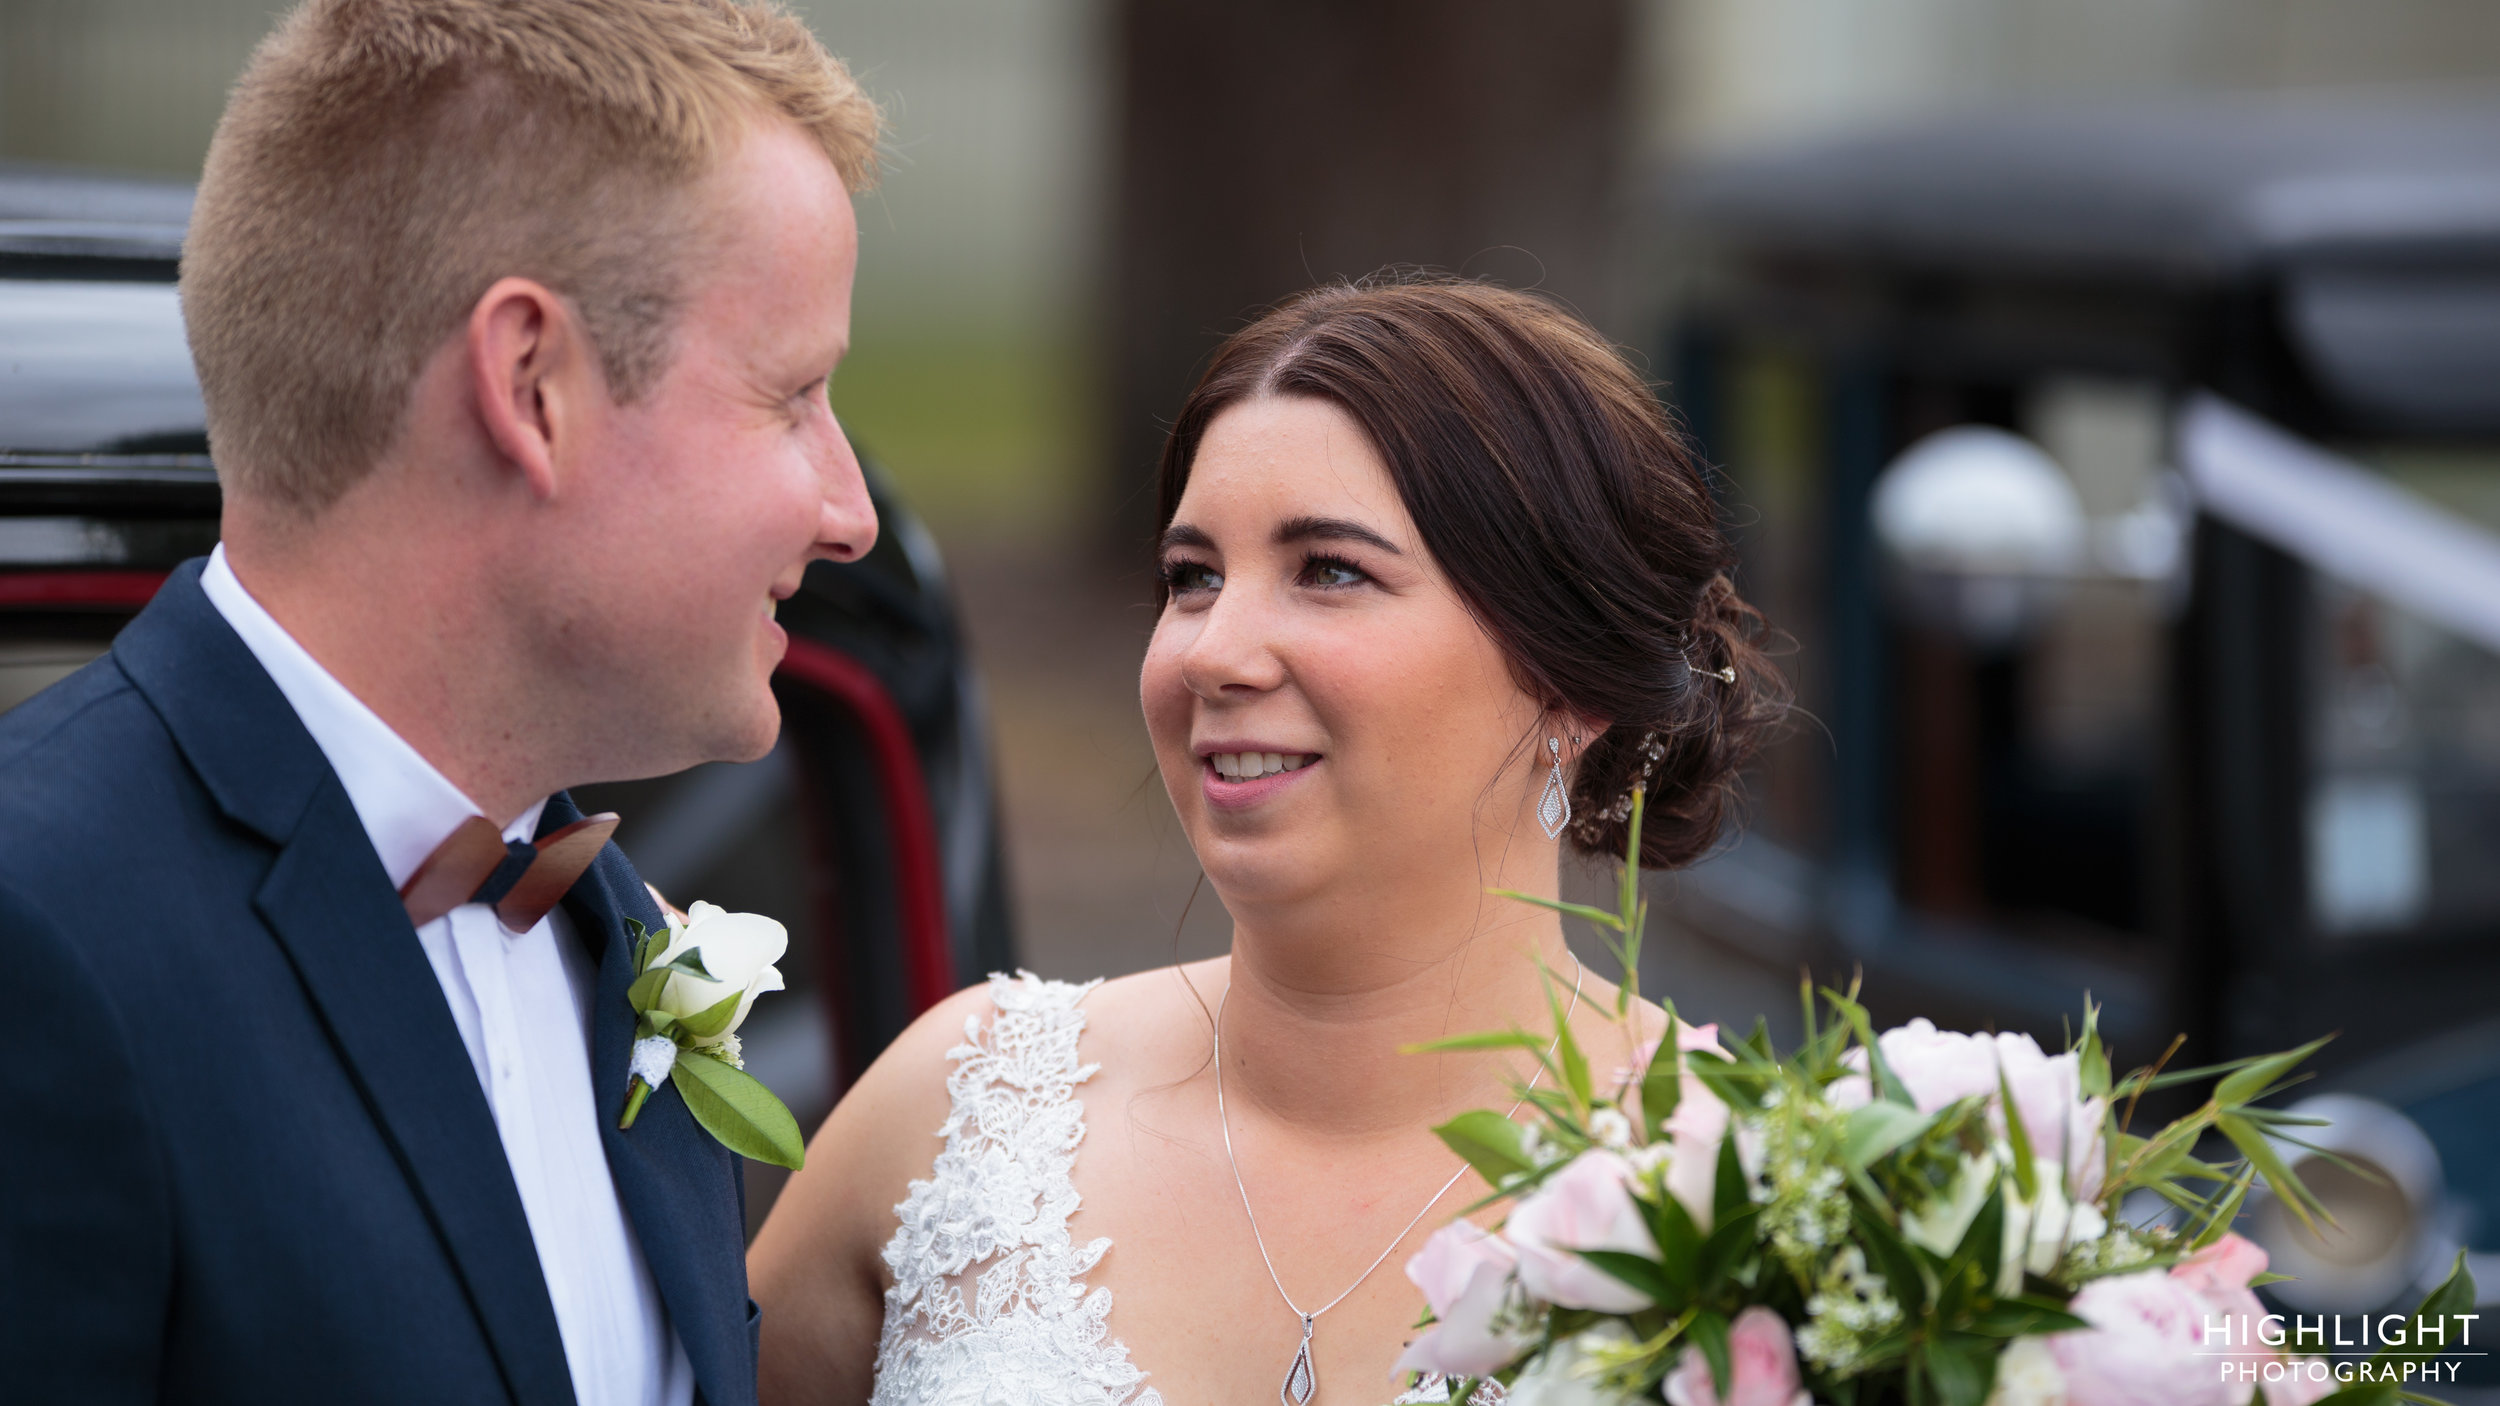 JM-2017-Highlight-wedding-photography-palmerston-north-new-zealand-79.jpg